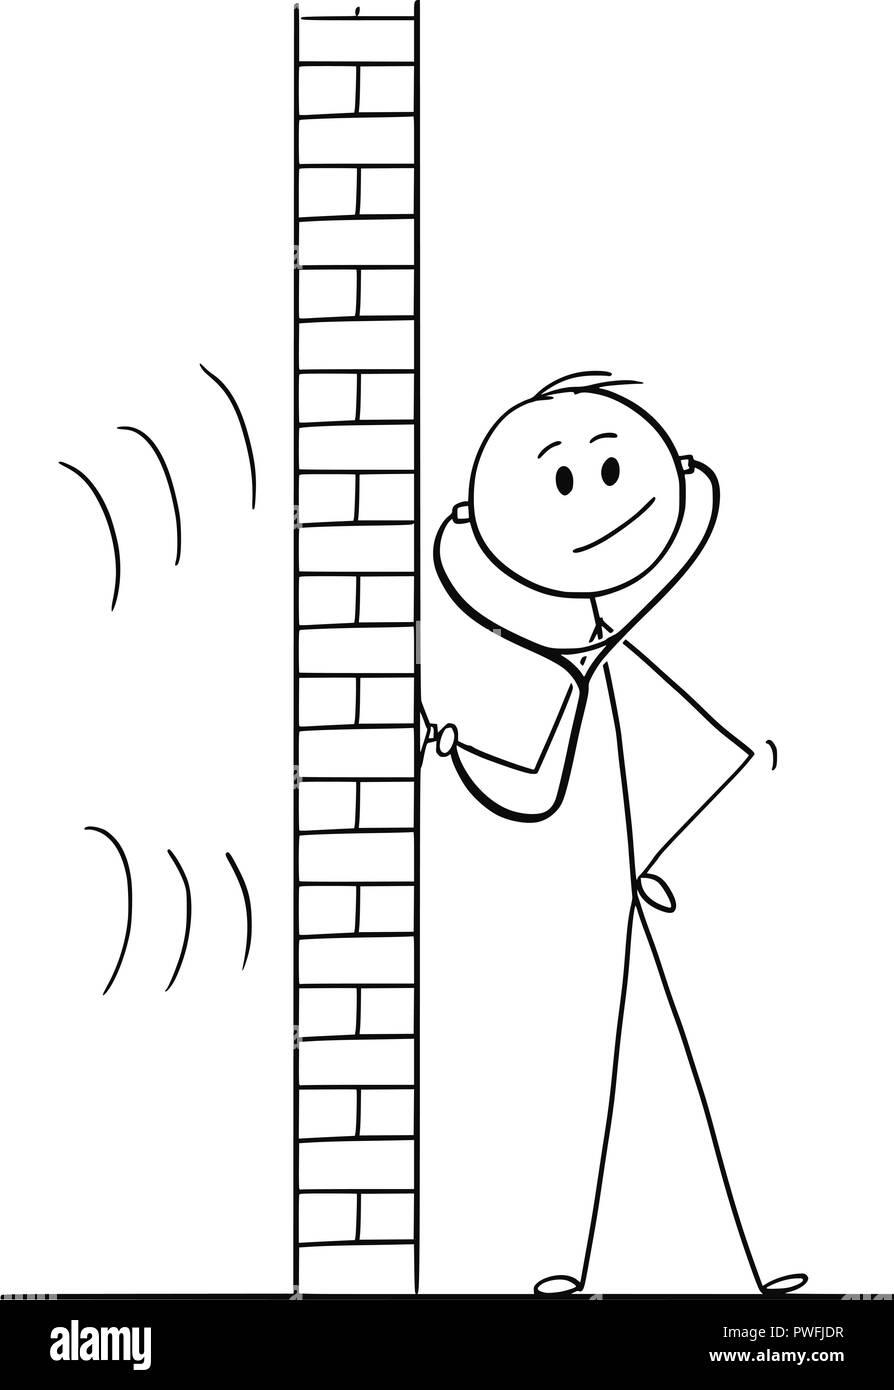 Cartoon of Man Using Stethoscope or Phonendoscope To Spy - Stock Vector